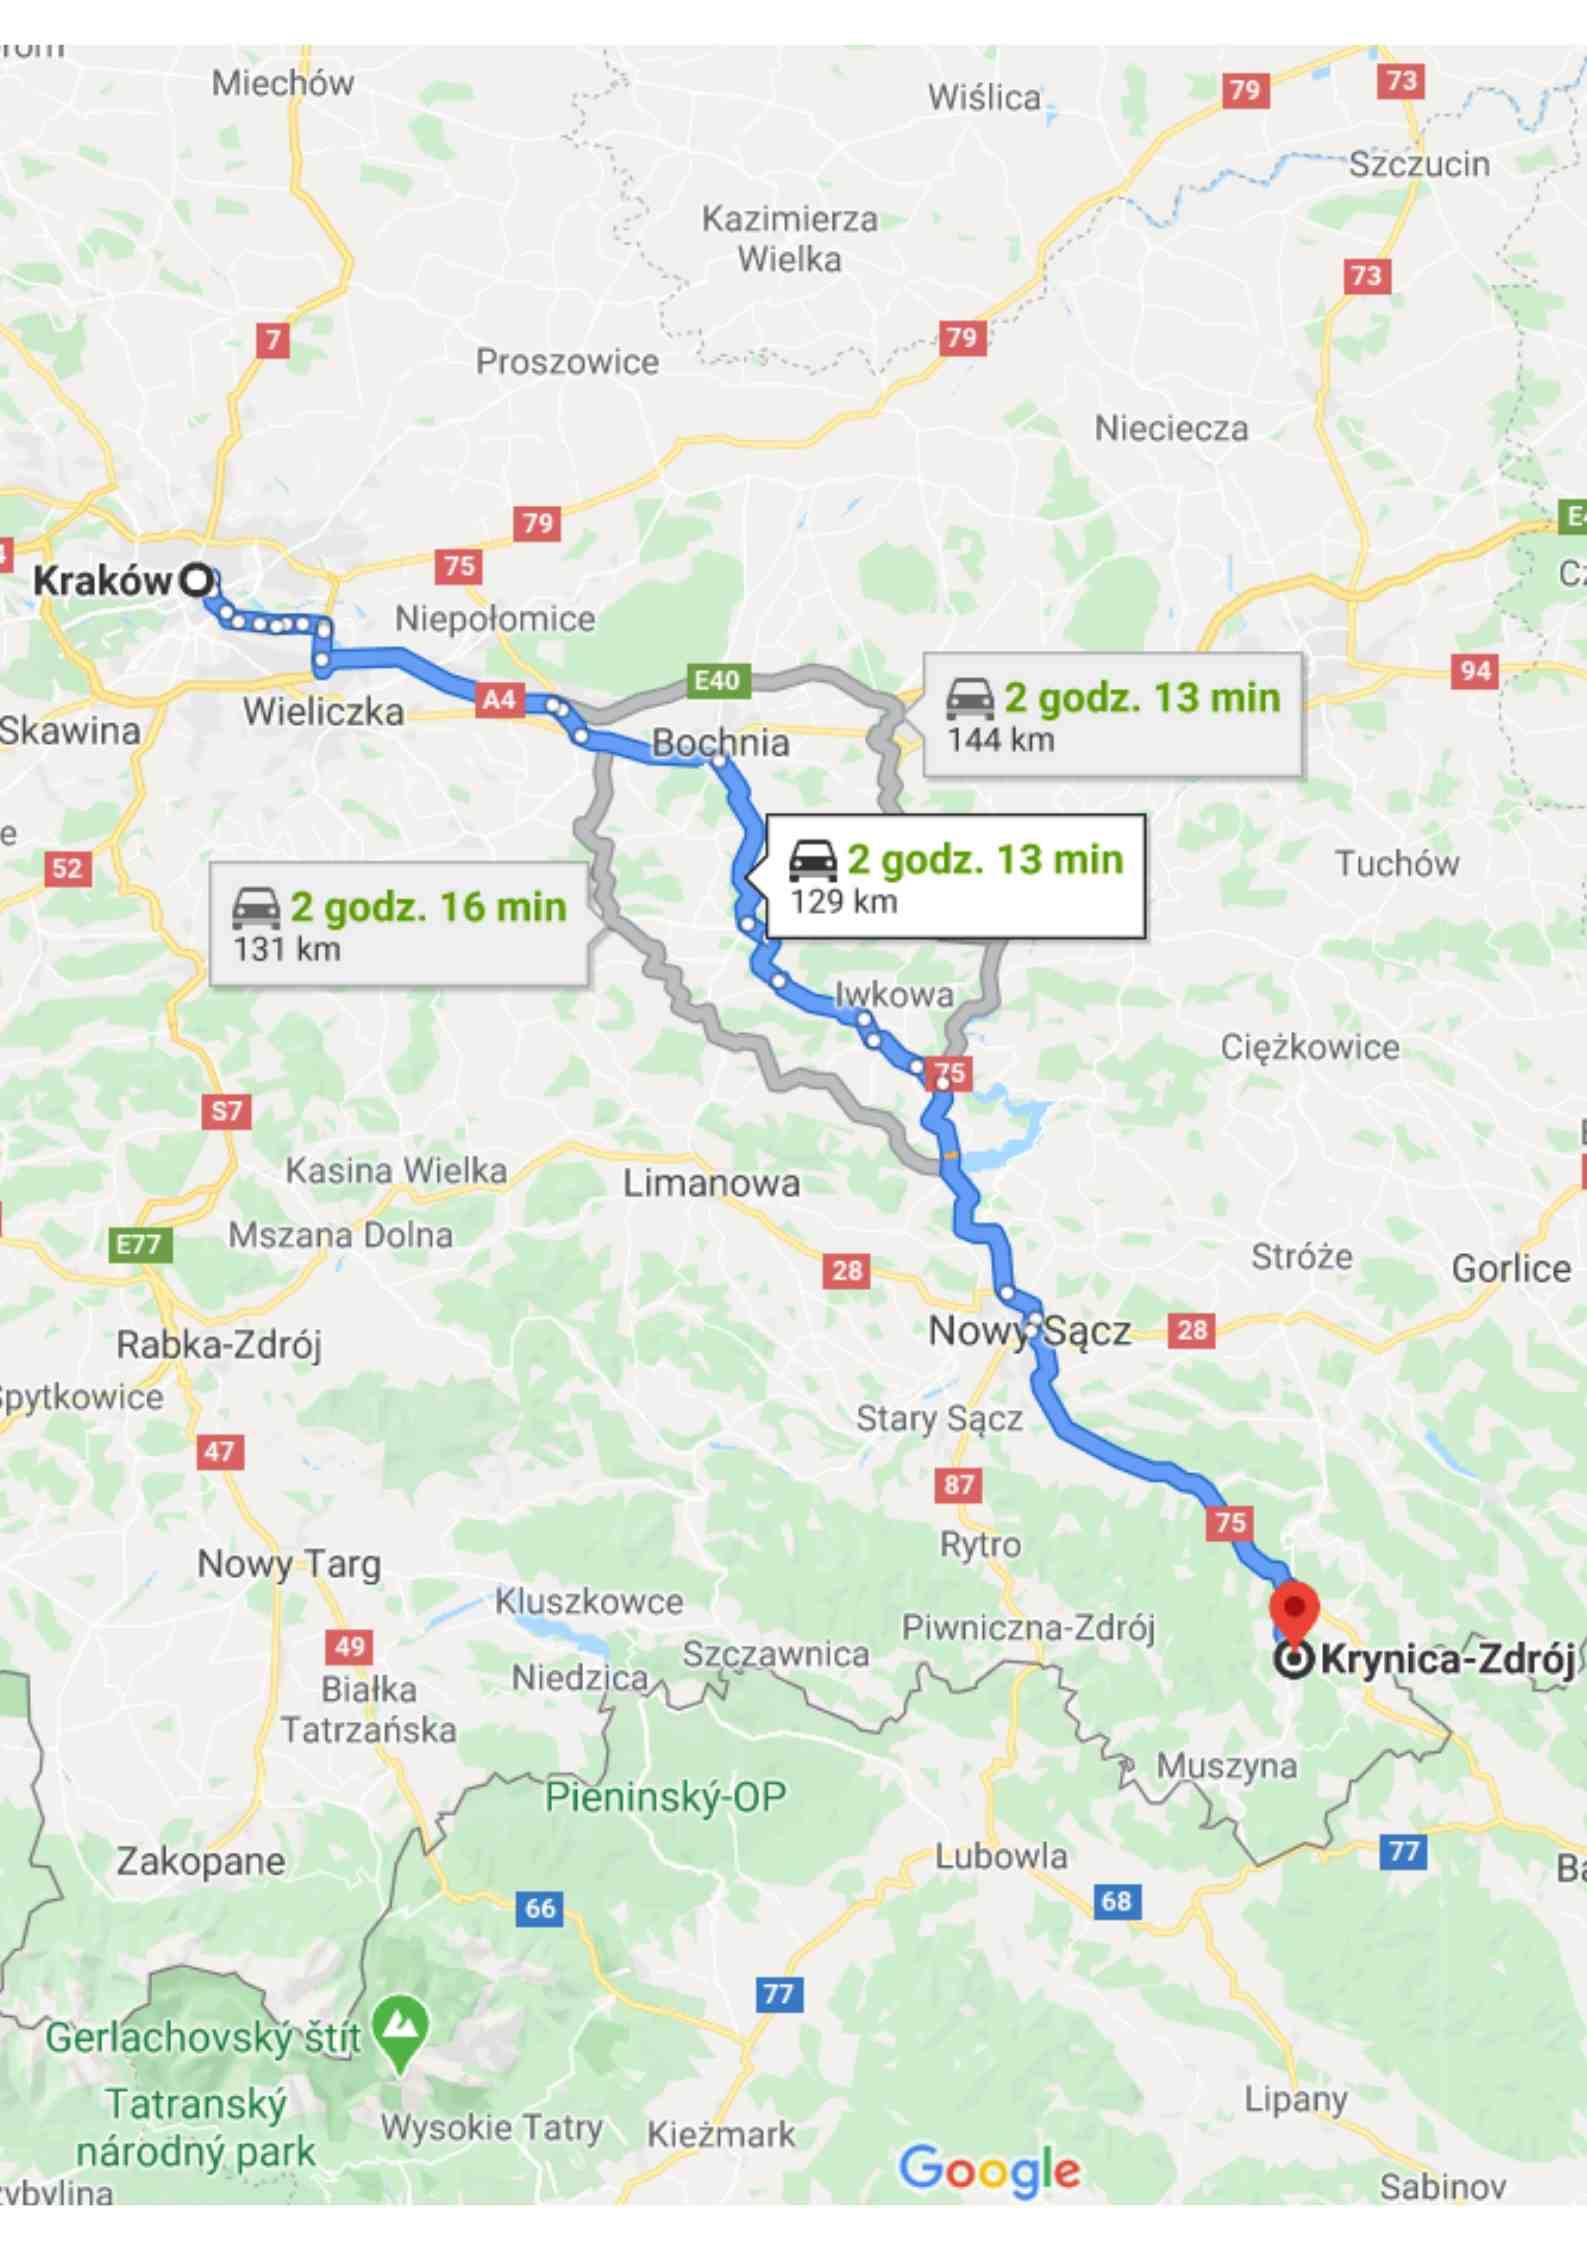 Mapa, dojazd do Krynicy